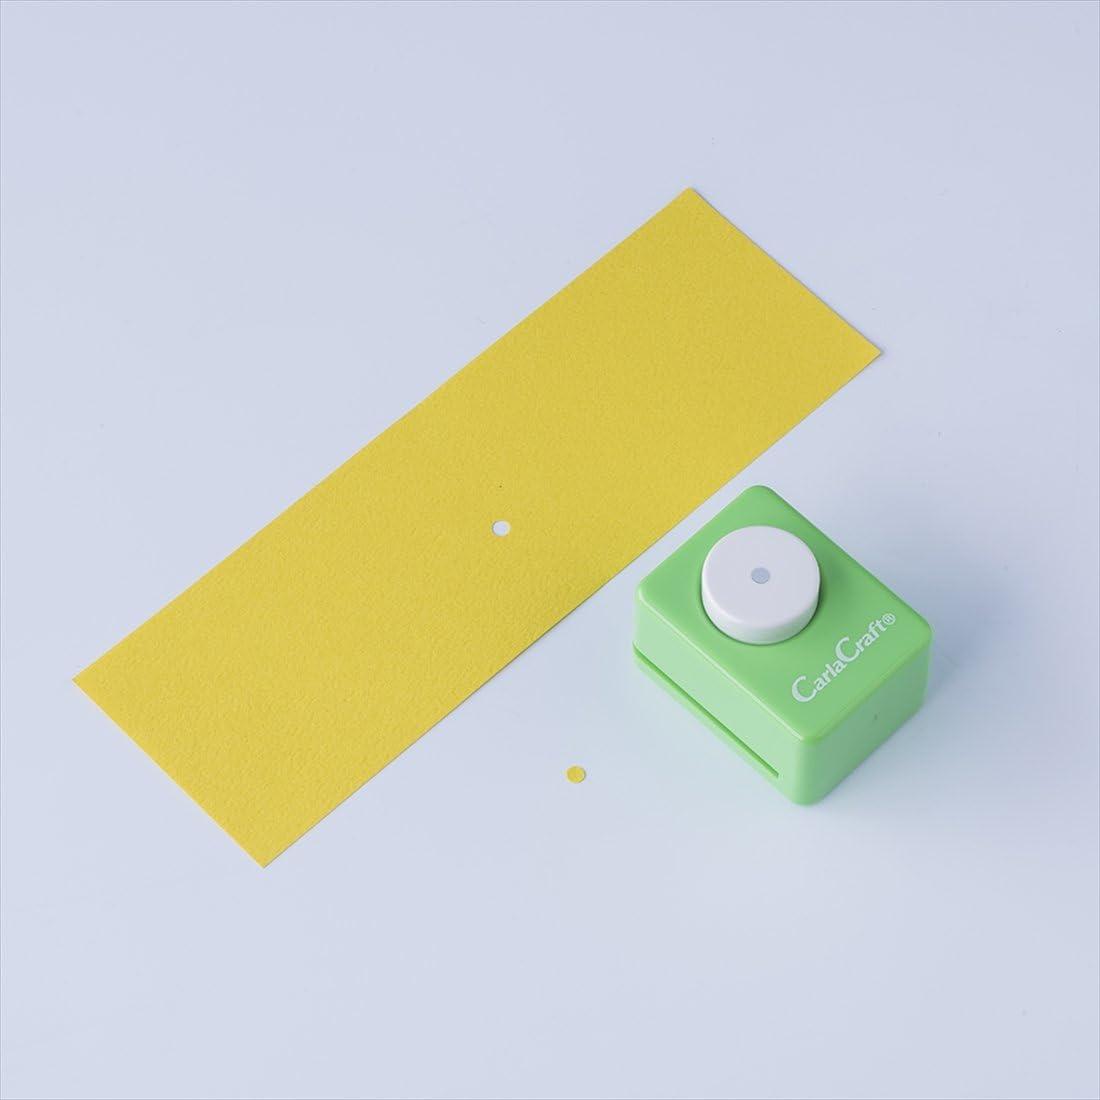 Circle 1//8 Carl Craft Small Size Craft Paper Punch CP-1 Circle 1//8